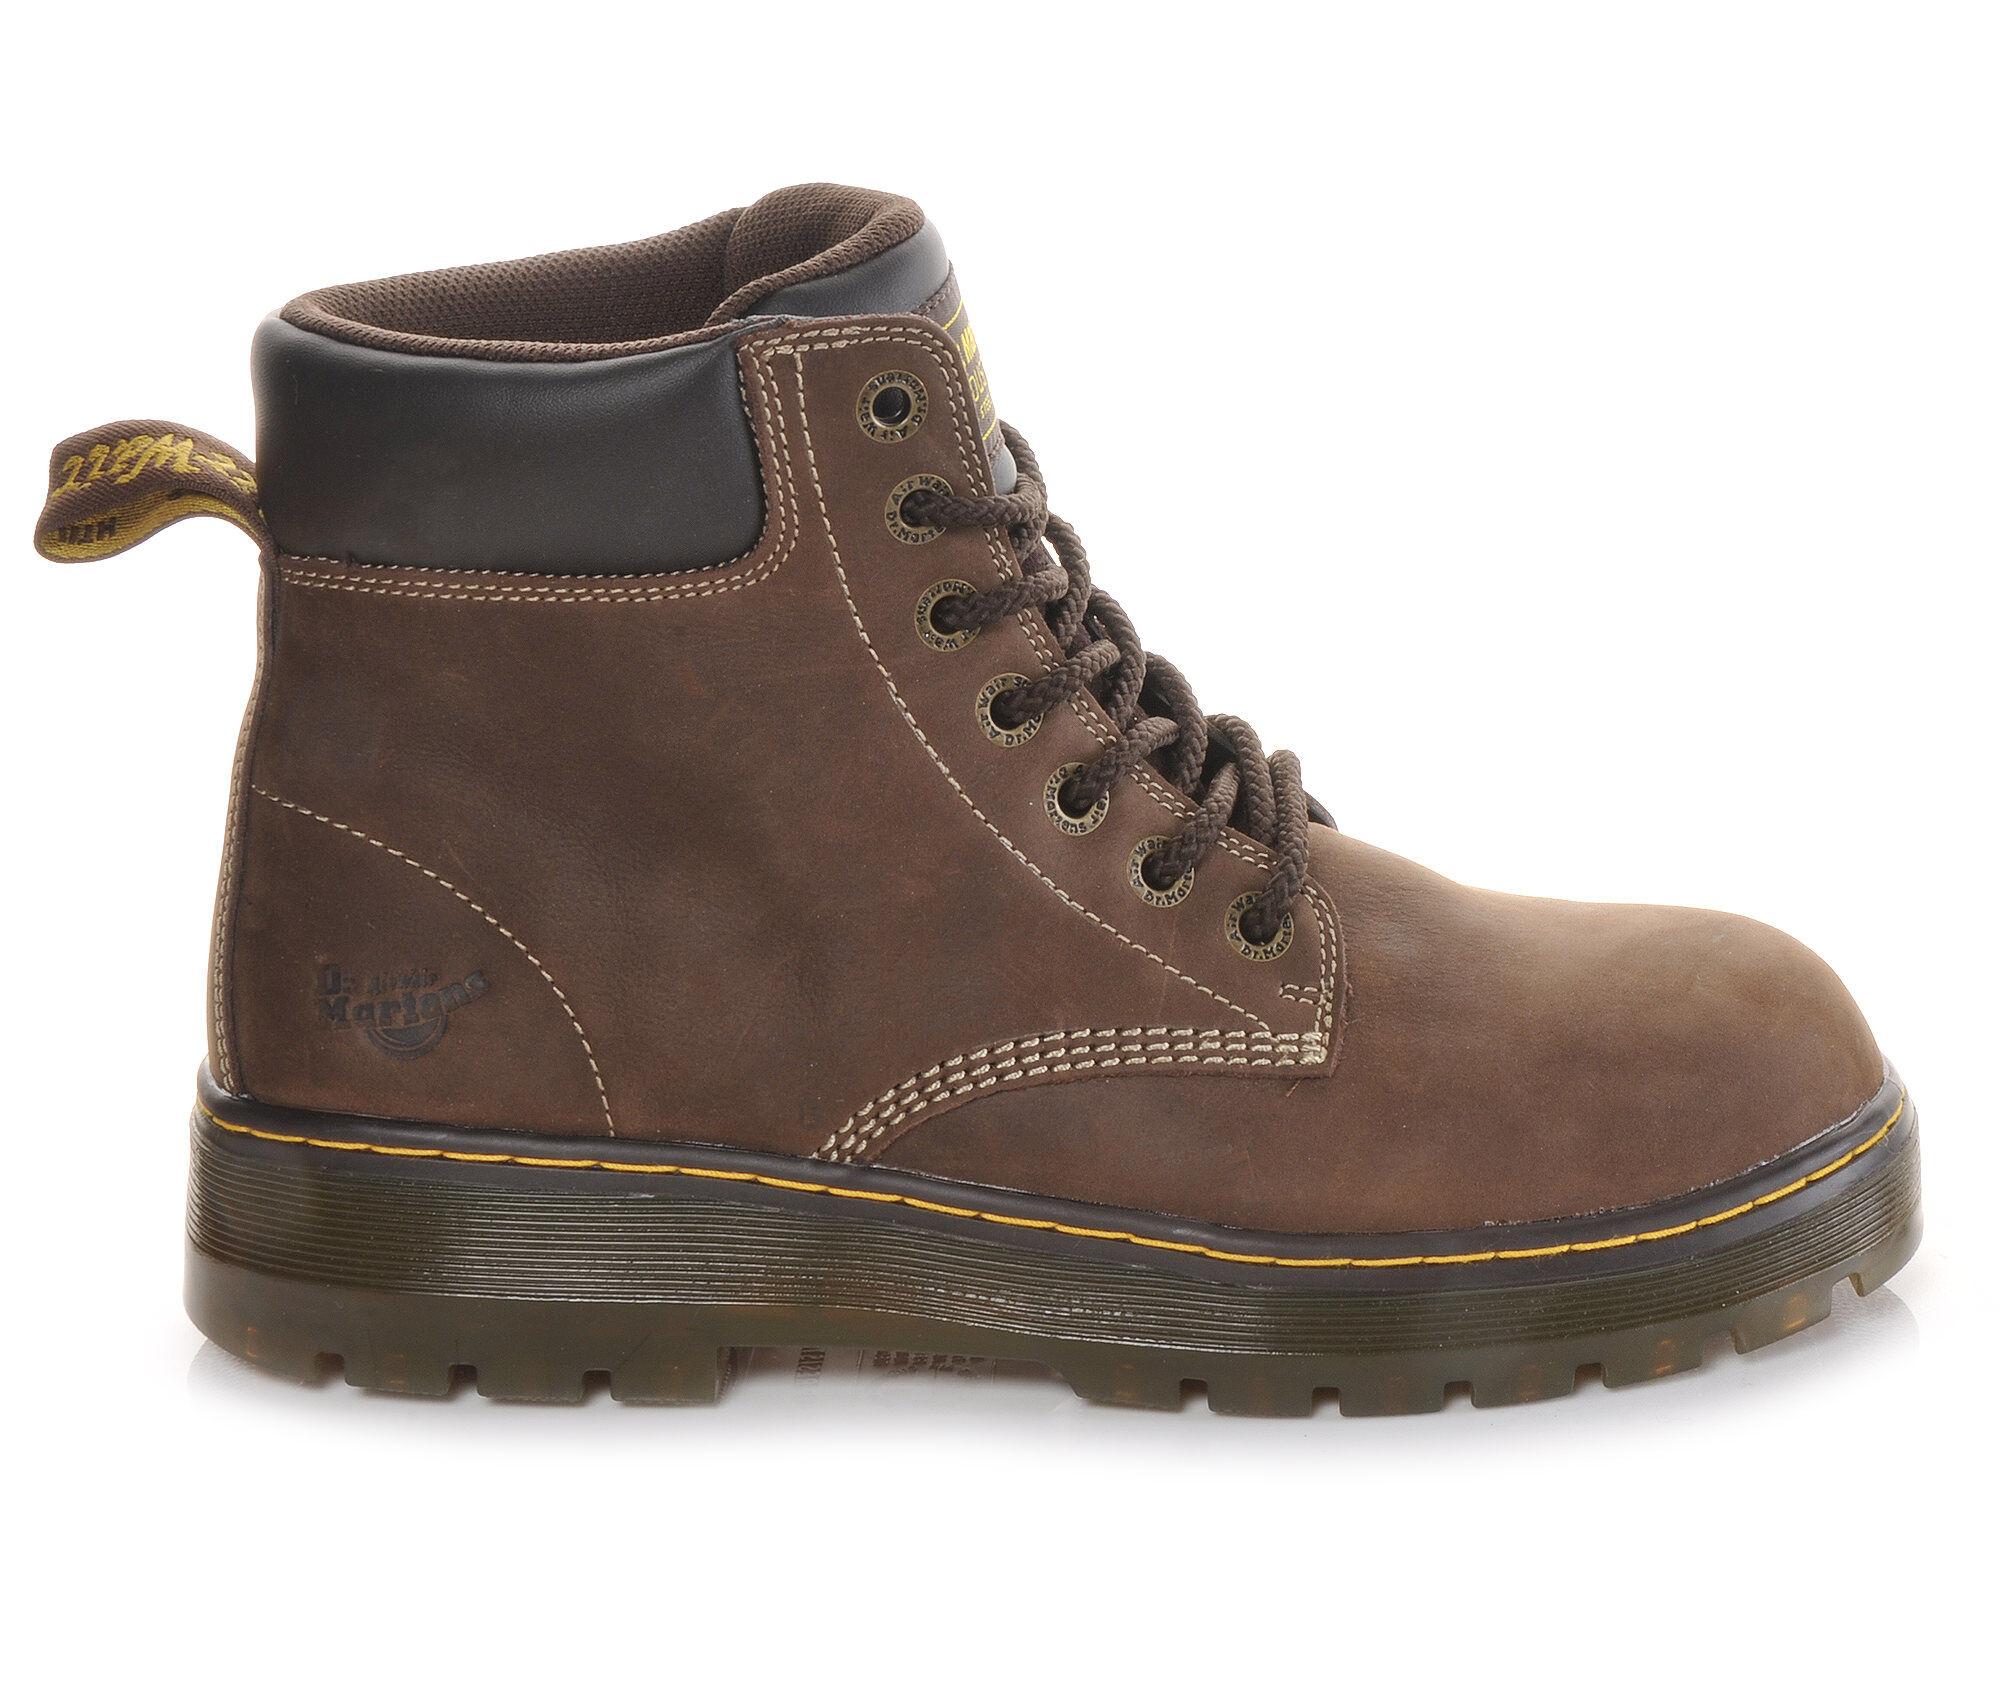 Men's Dr. Martens Industrial Winch Steel Toe Work Boots Brown Wyoming